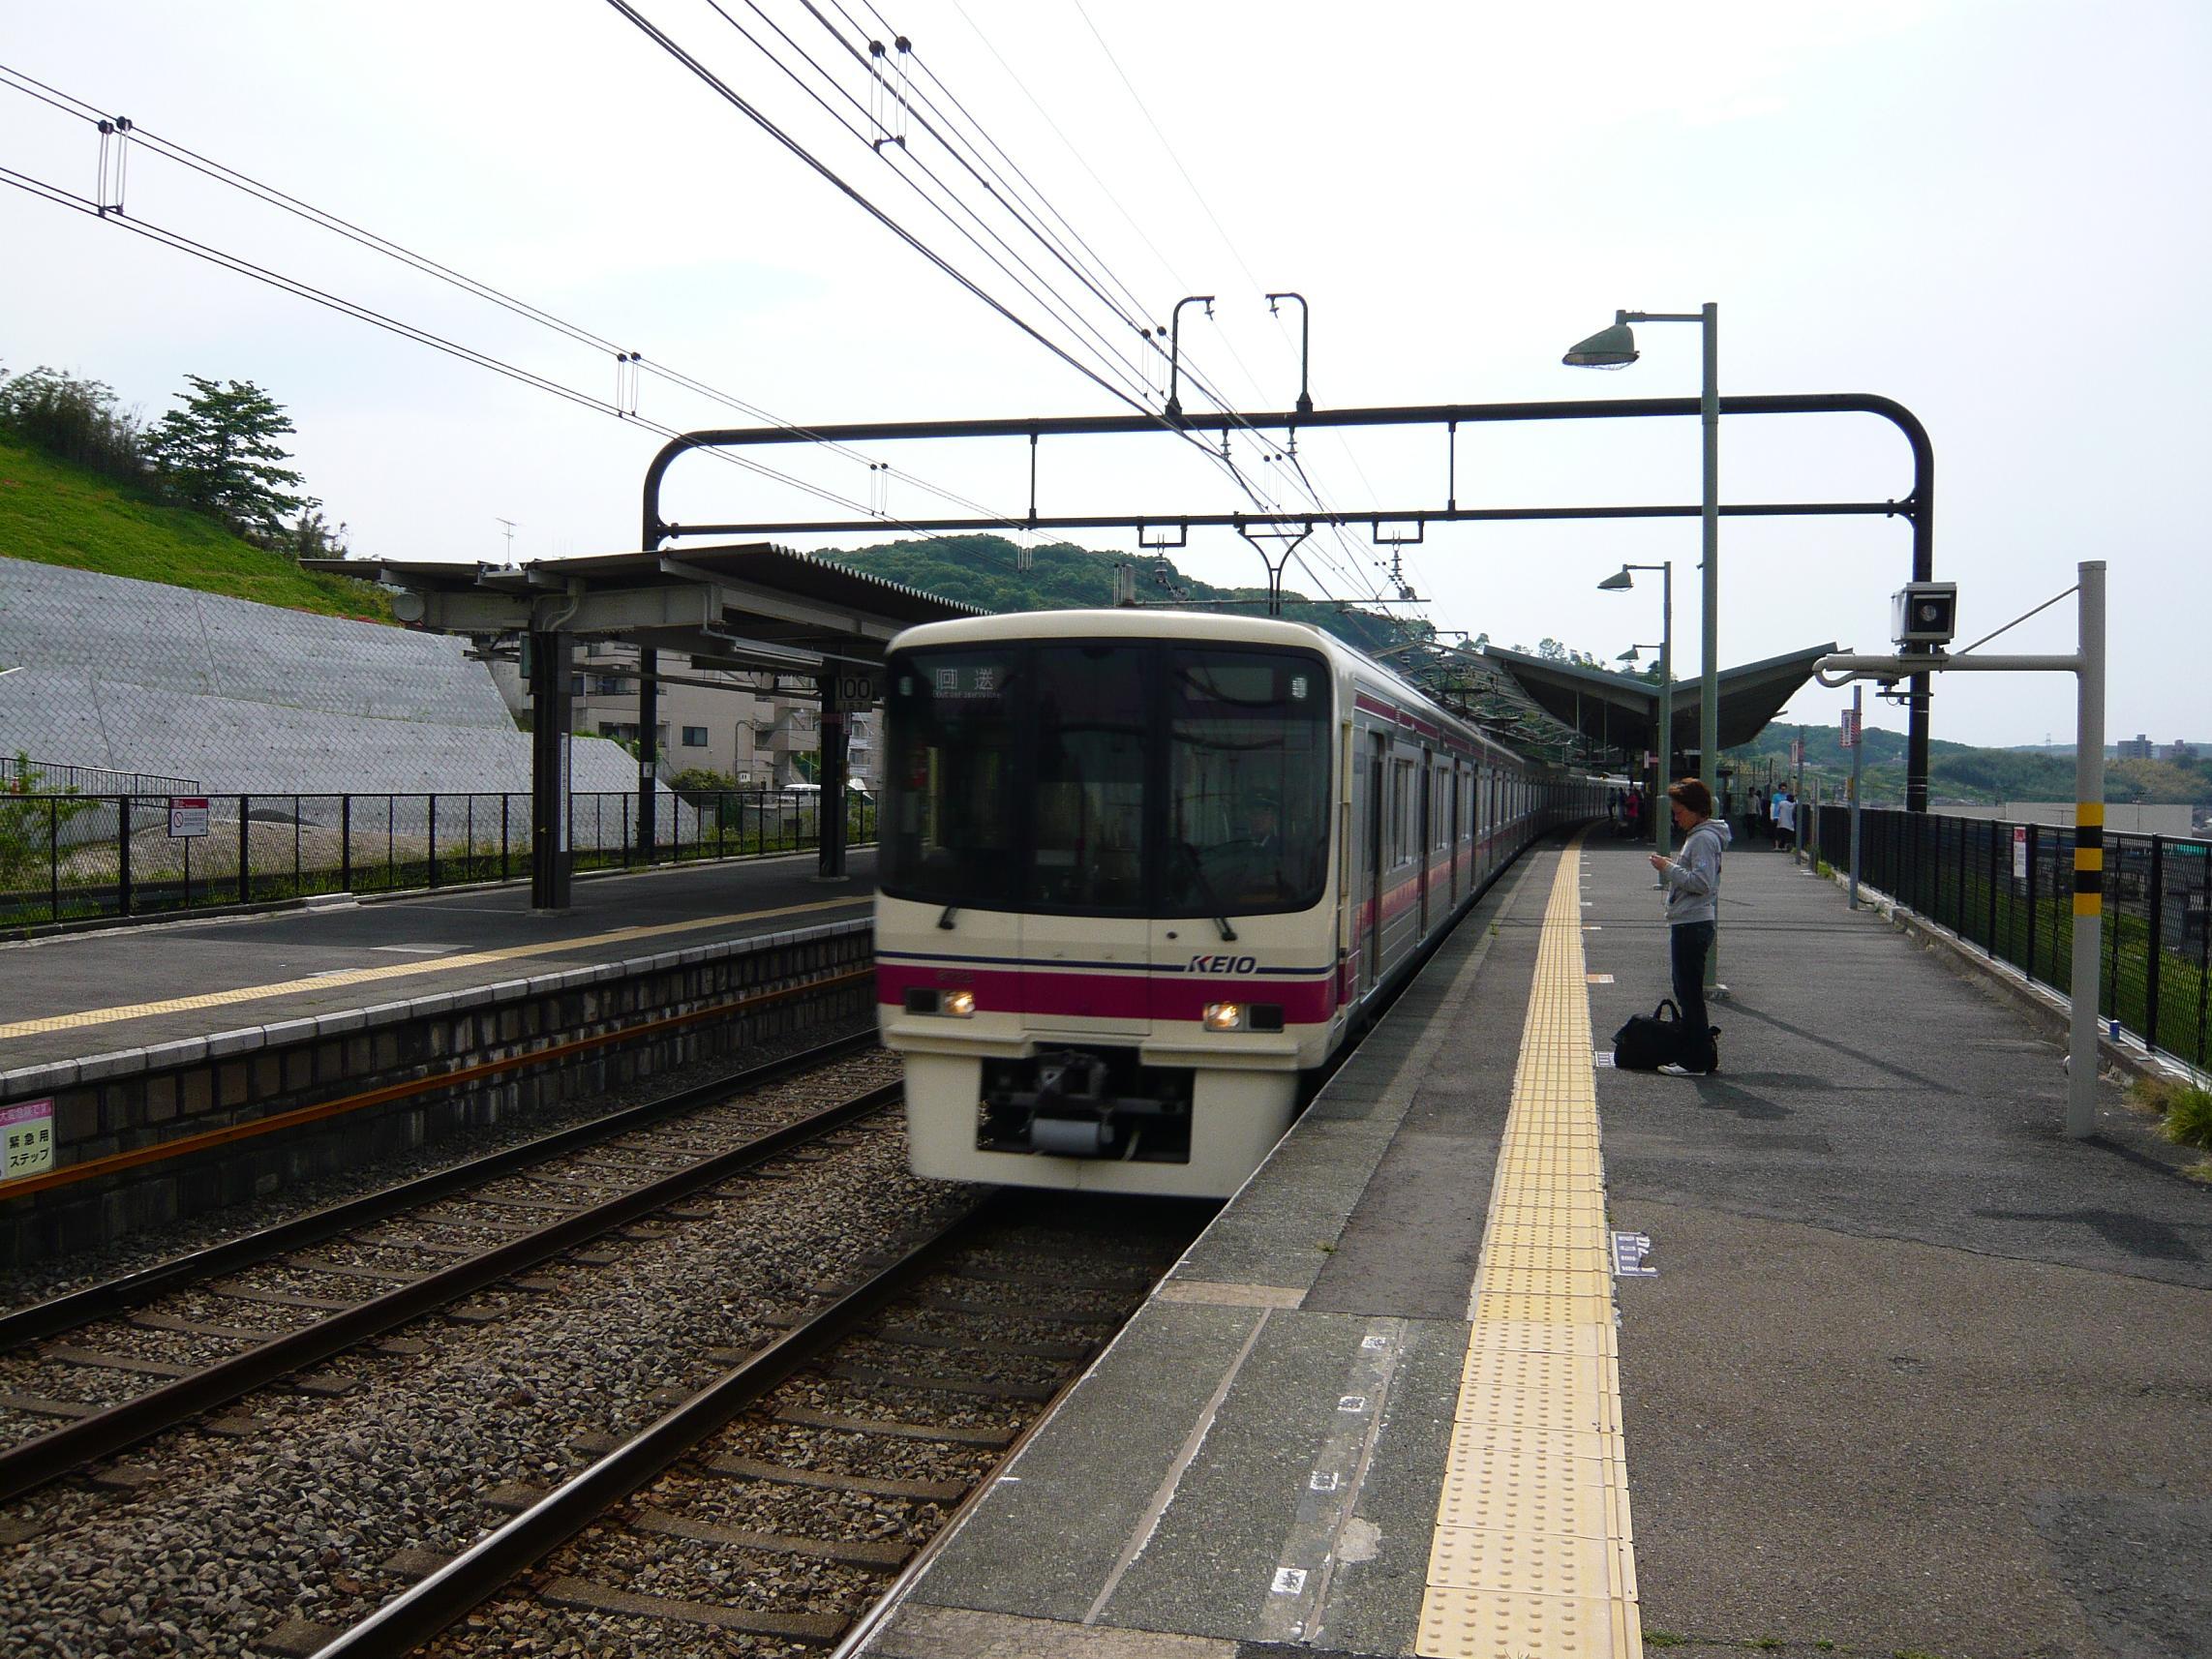 P1010668-2.JPG